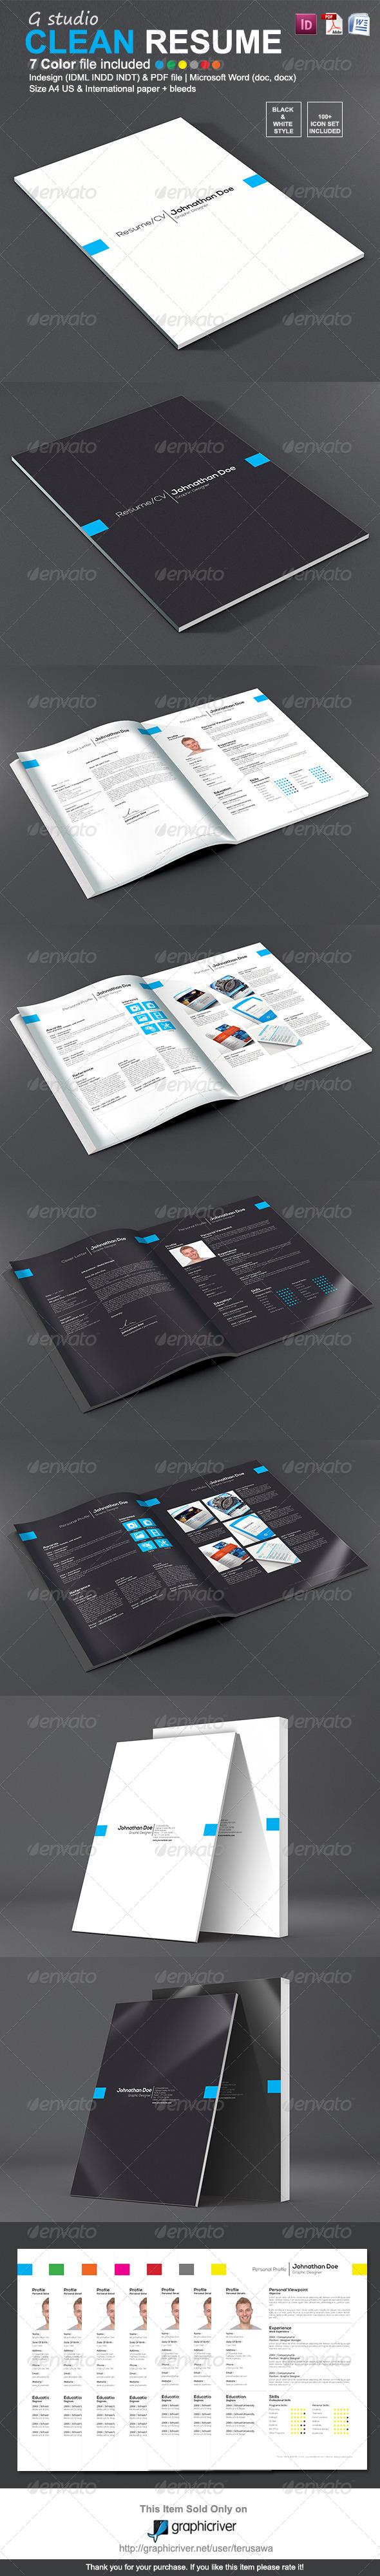 Gstudio Clean Resume Template Clean resume template